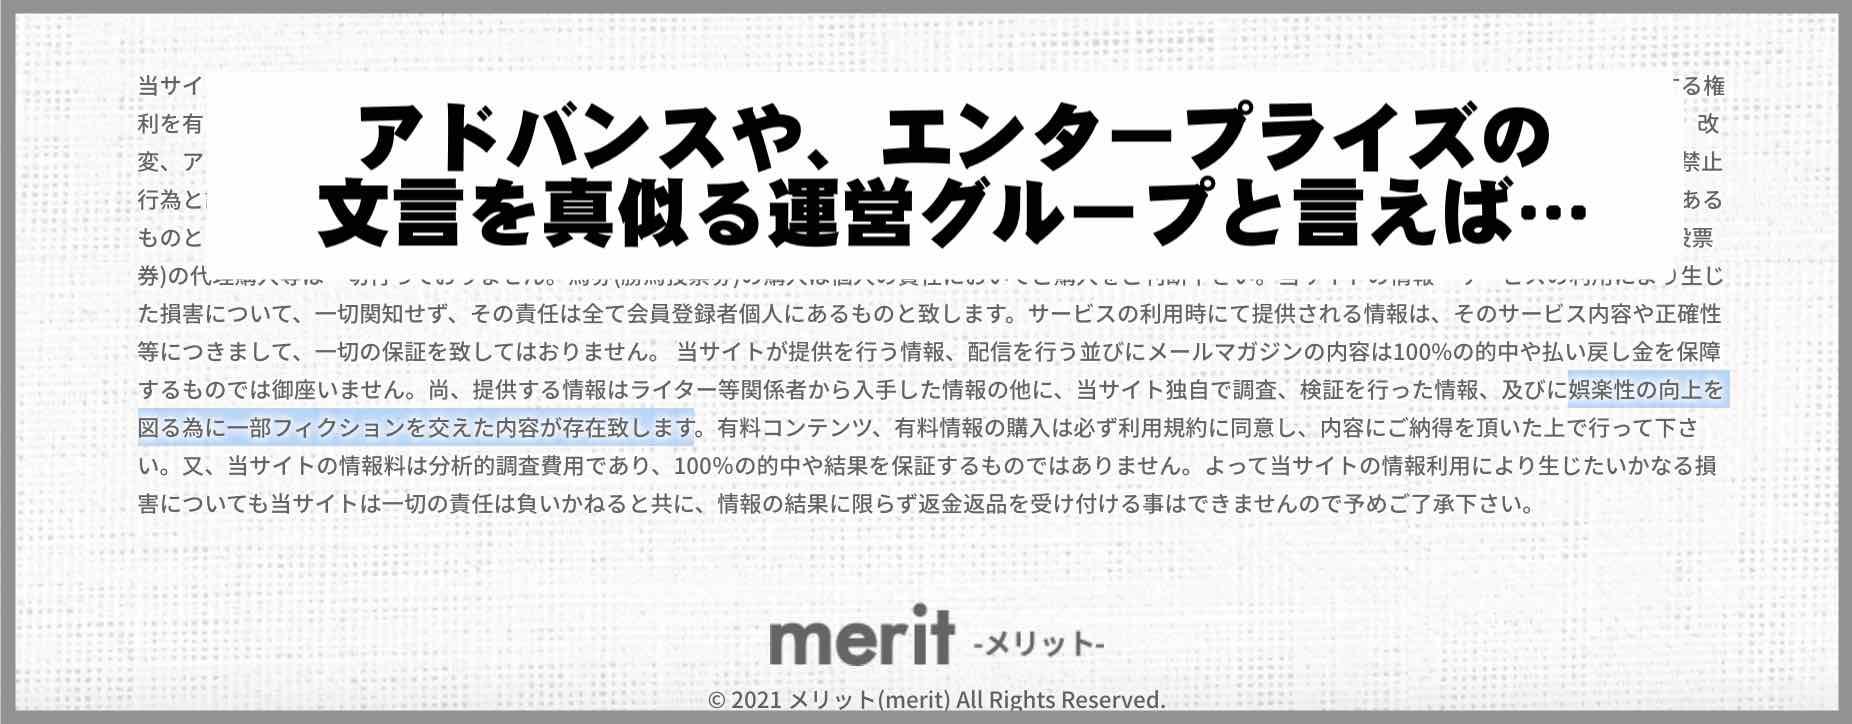 merit(メリット)のパクリ文言